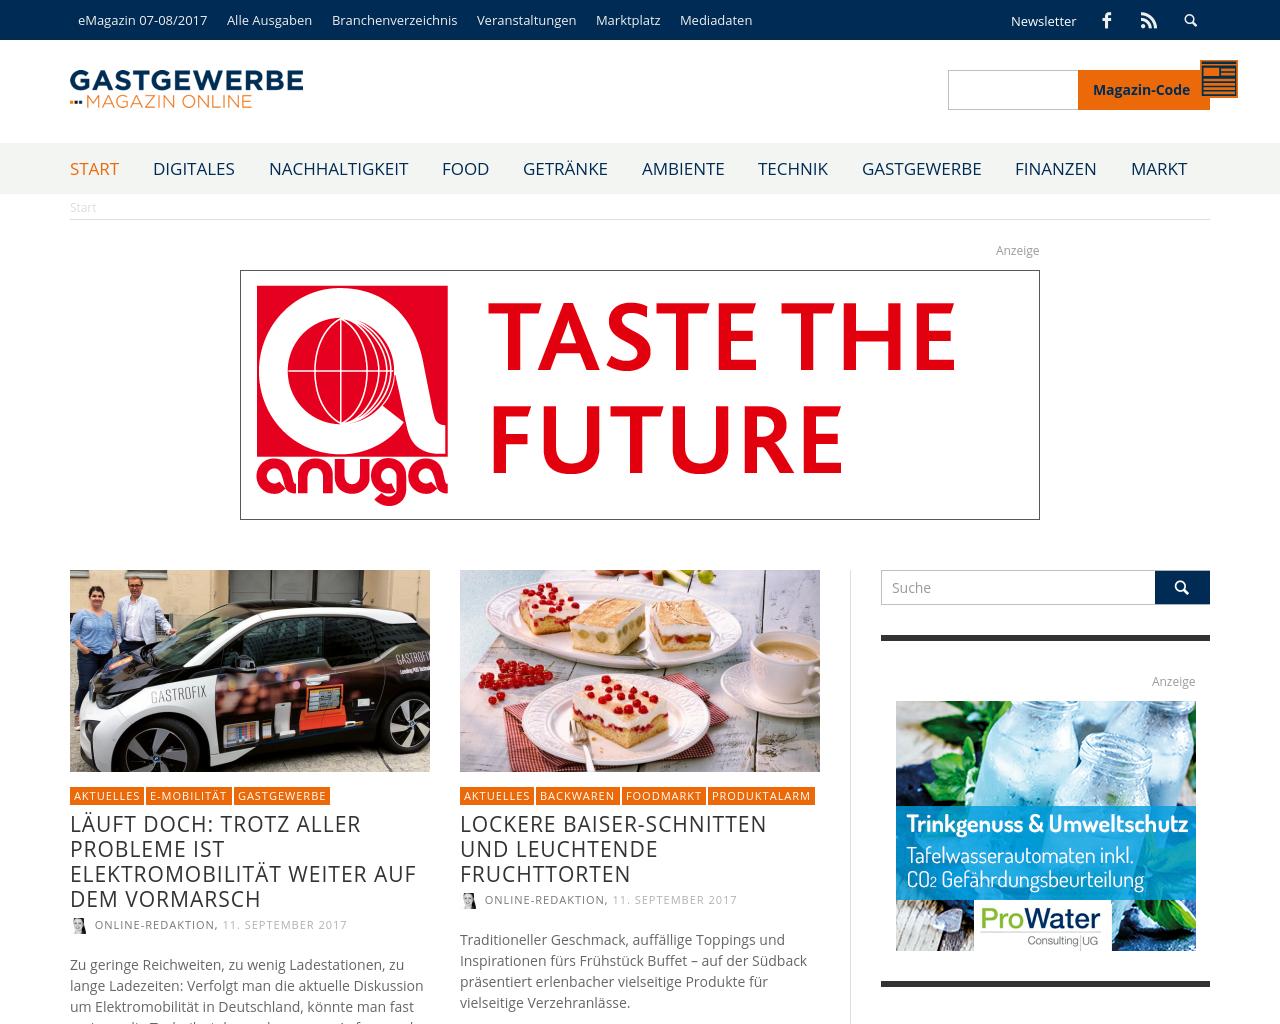 Gastgewerbe-Magazin-Online-Advertising-Reviews-Pricing